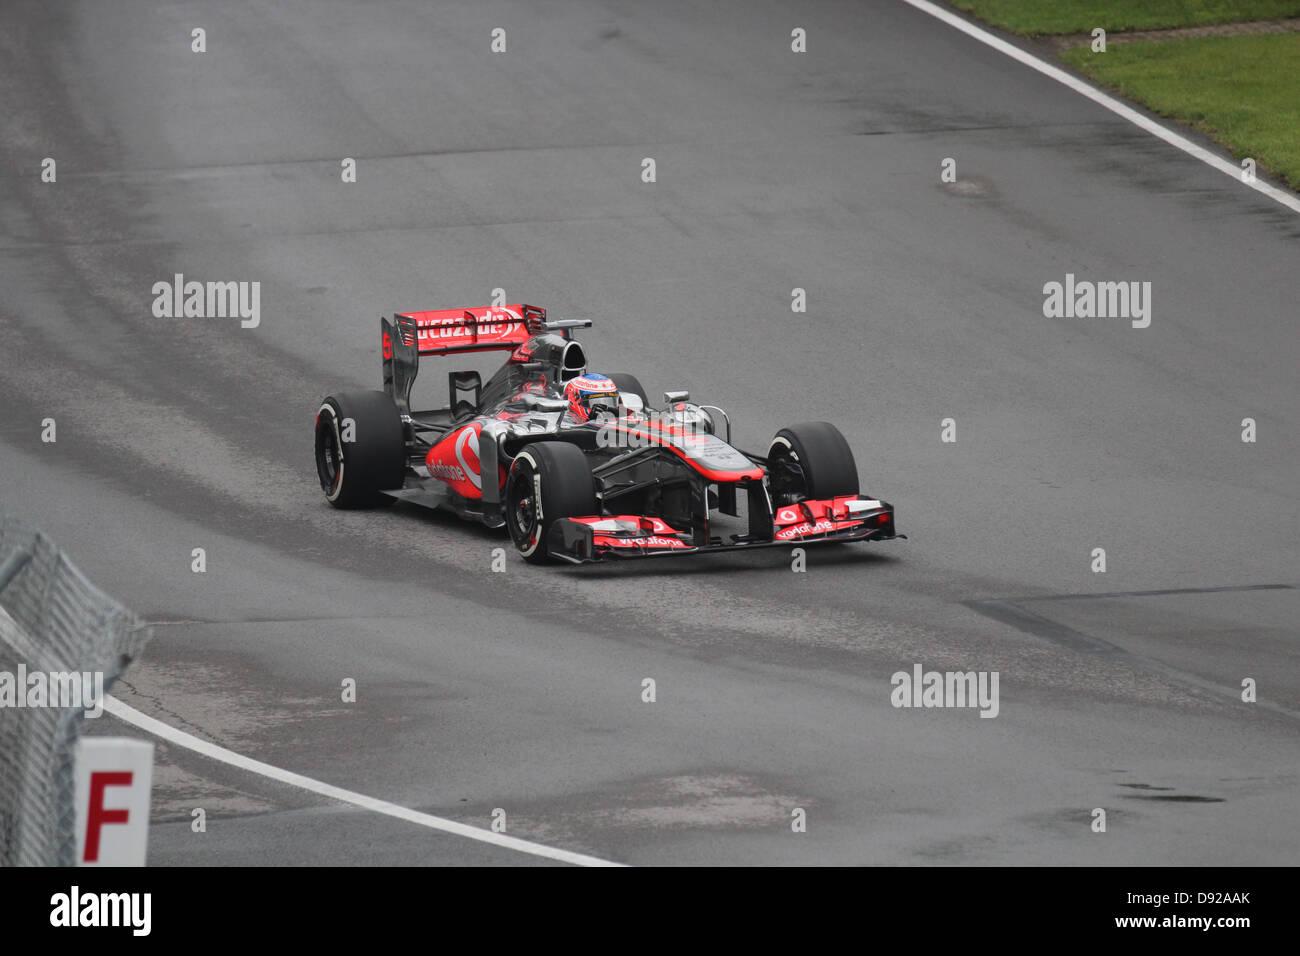 Jenson Button Formula 1 racing in Montreal Canada Stock Photo